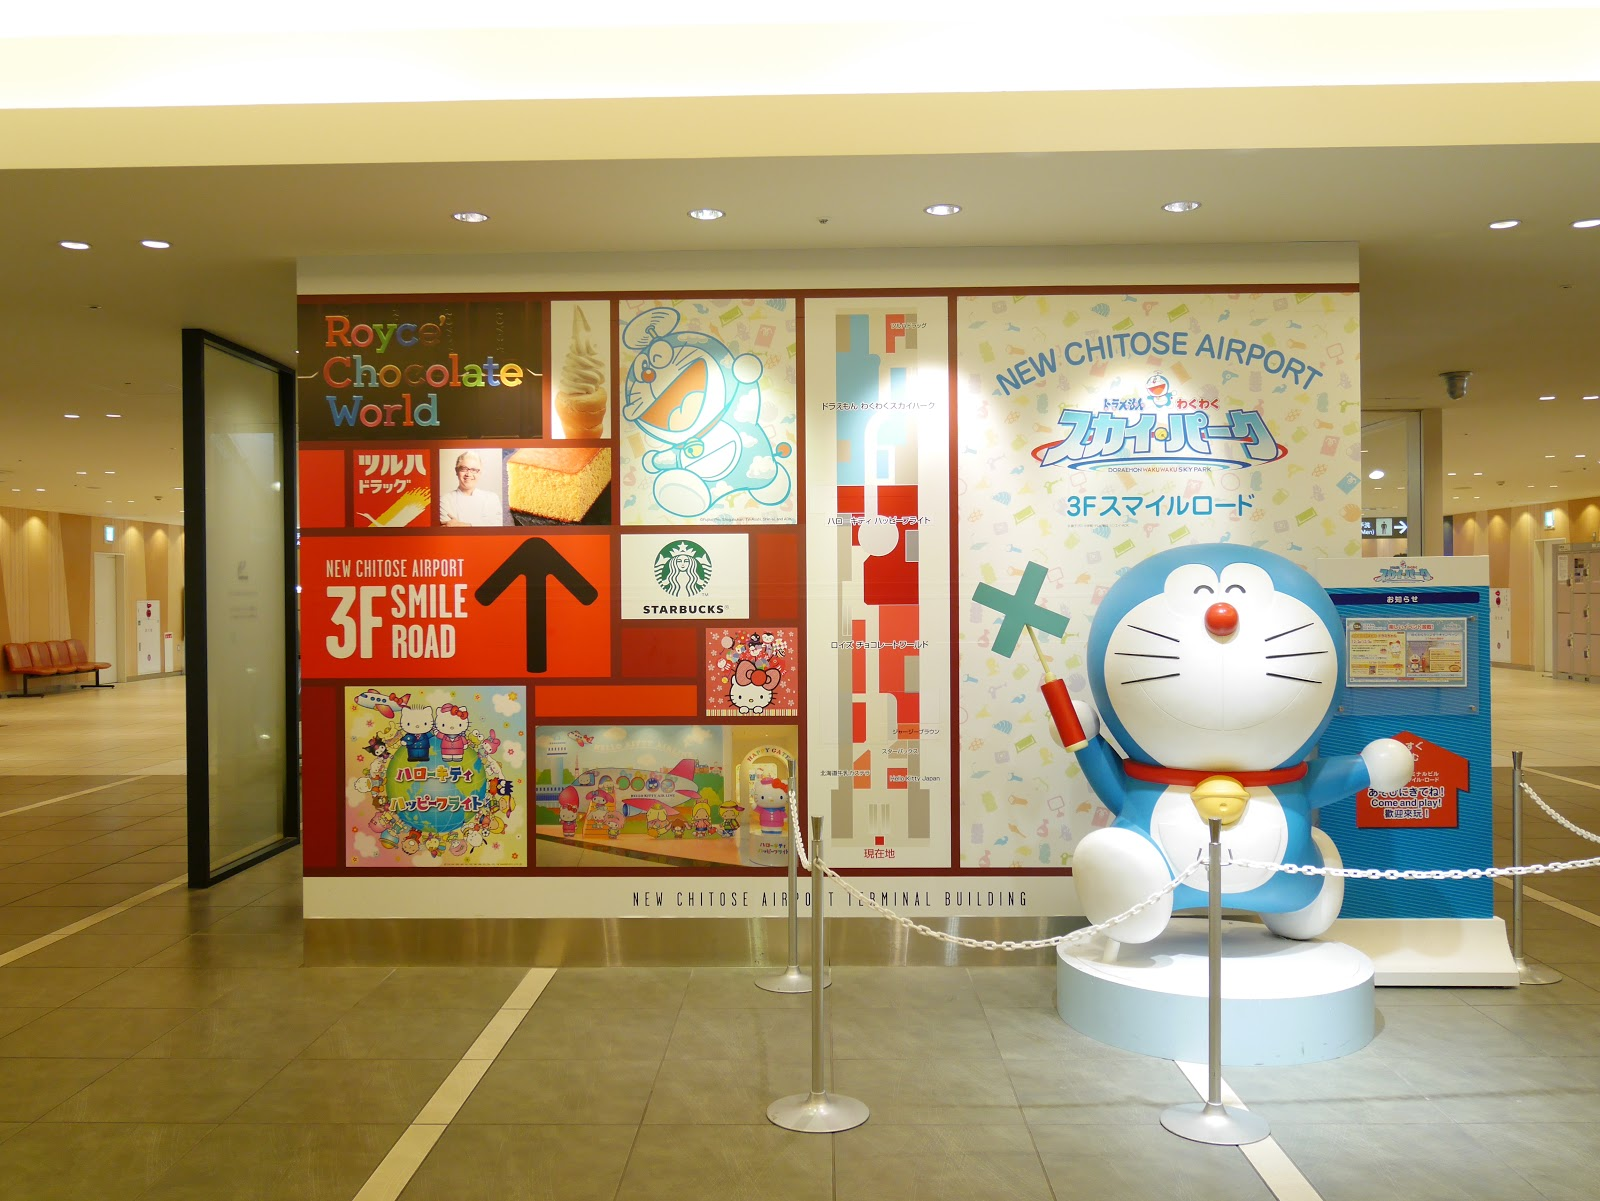 Entry Bergambar Hokkaido Day 1 Media Panas Tcash Vaganza 34 Monalisa Sarung Bantal Guling Motif Cars I Tak Tahu Lah Korang Macam Mana Tapi Memang Obses Jugak Ah Dengan Komik Doraemon Ni Dulu Dan Masih Dendam Kesumat Kat Pengawas Yang Rampas Beli